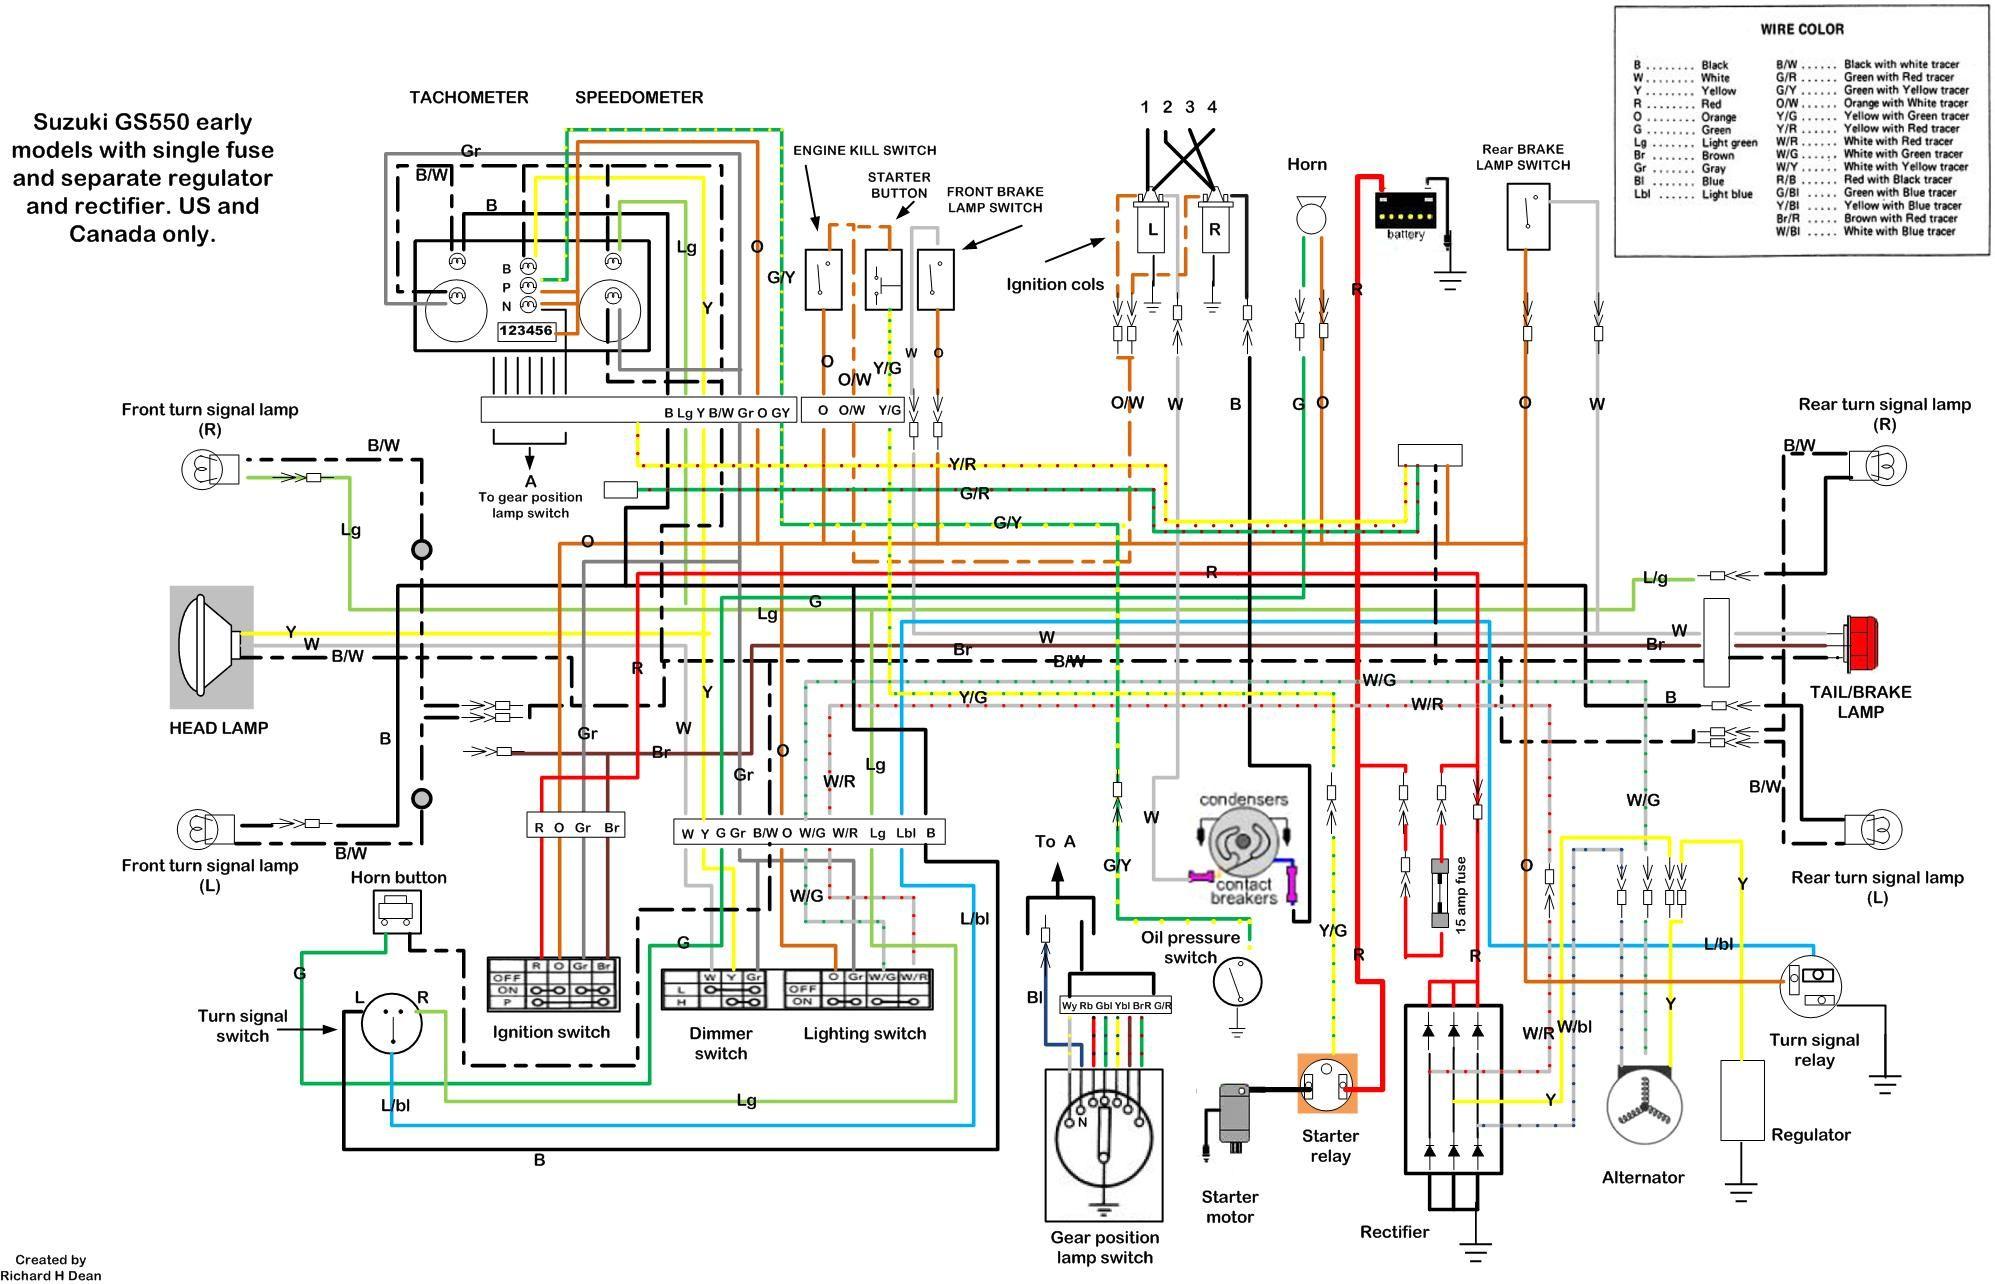 Amazing 1981 Suzuki Wiring Diagram Wiring Diagram Wiring Cloud Itislusmarecoveryedborg